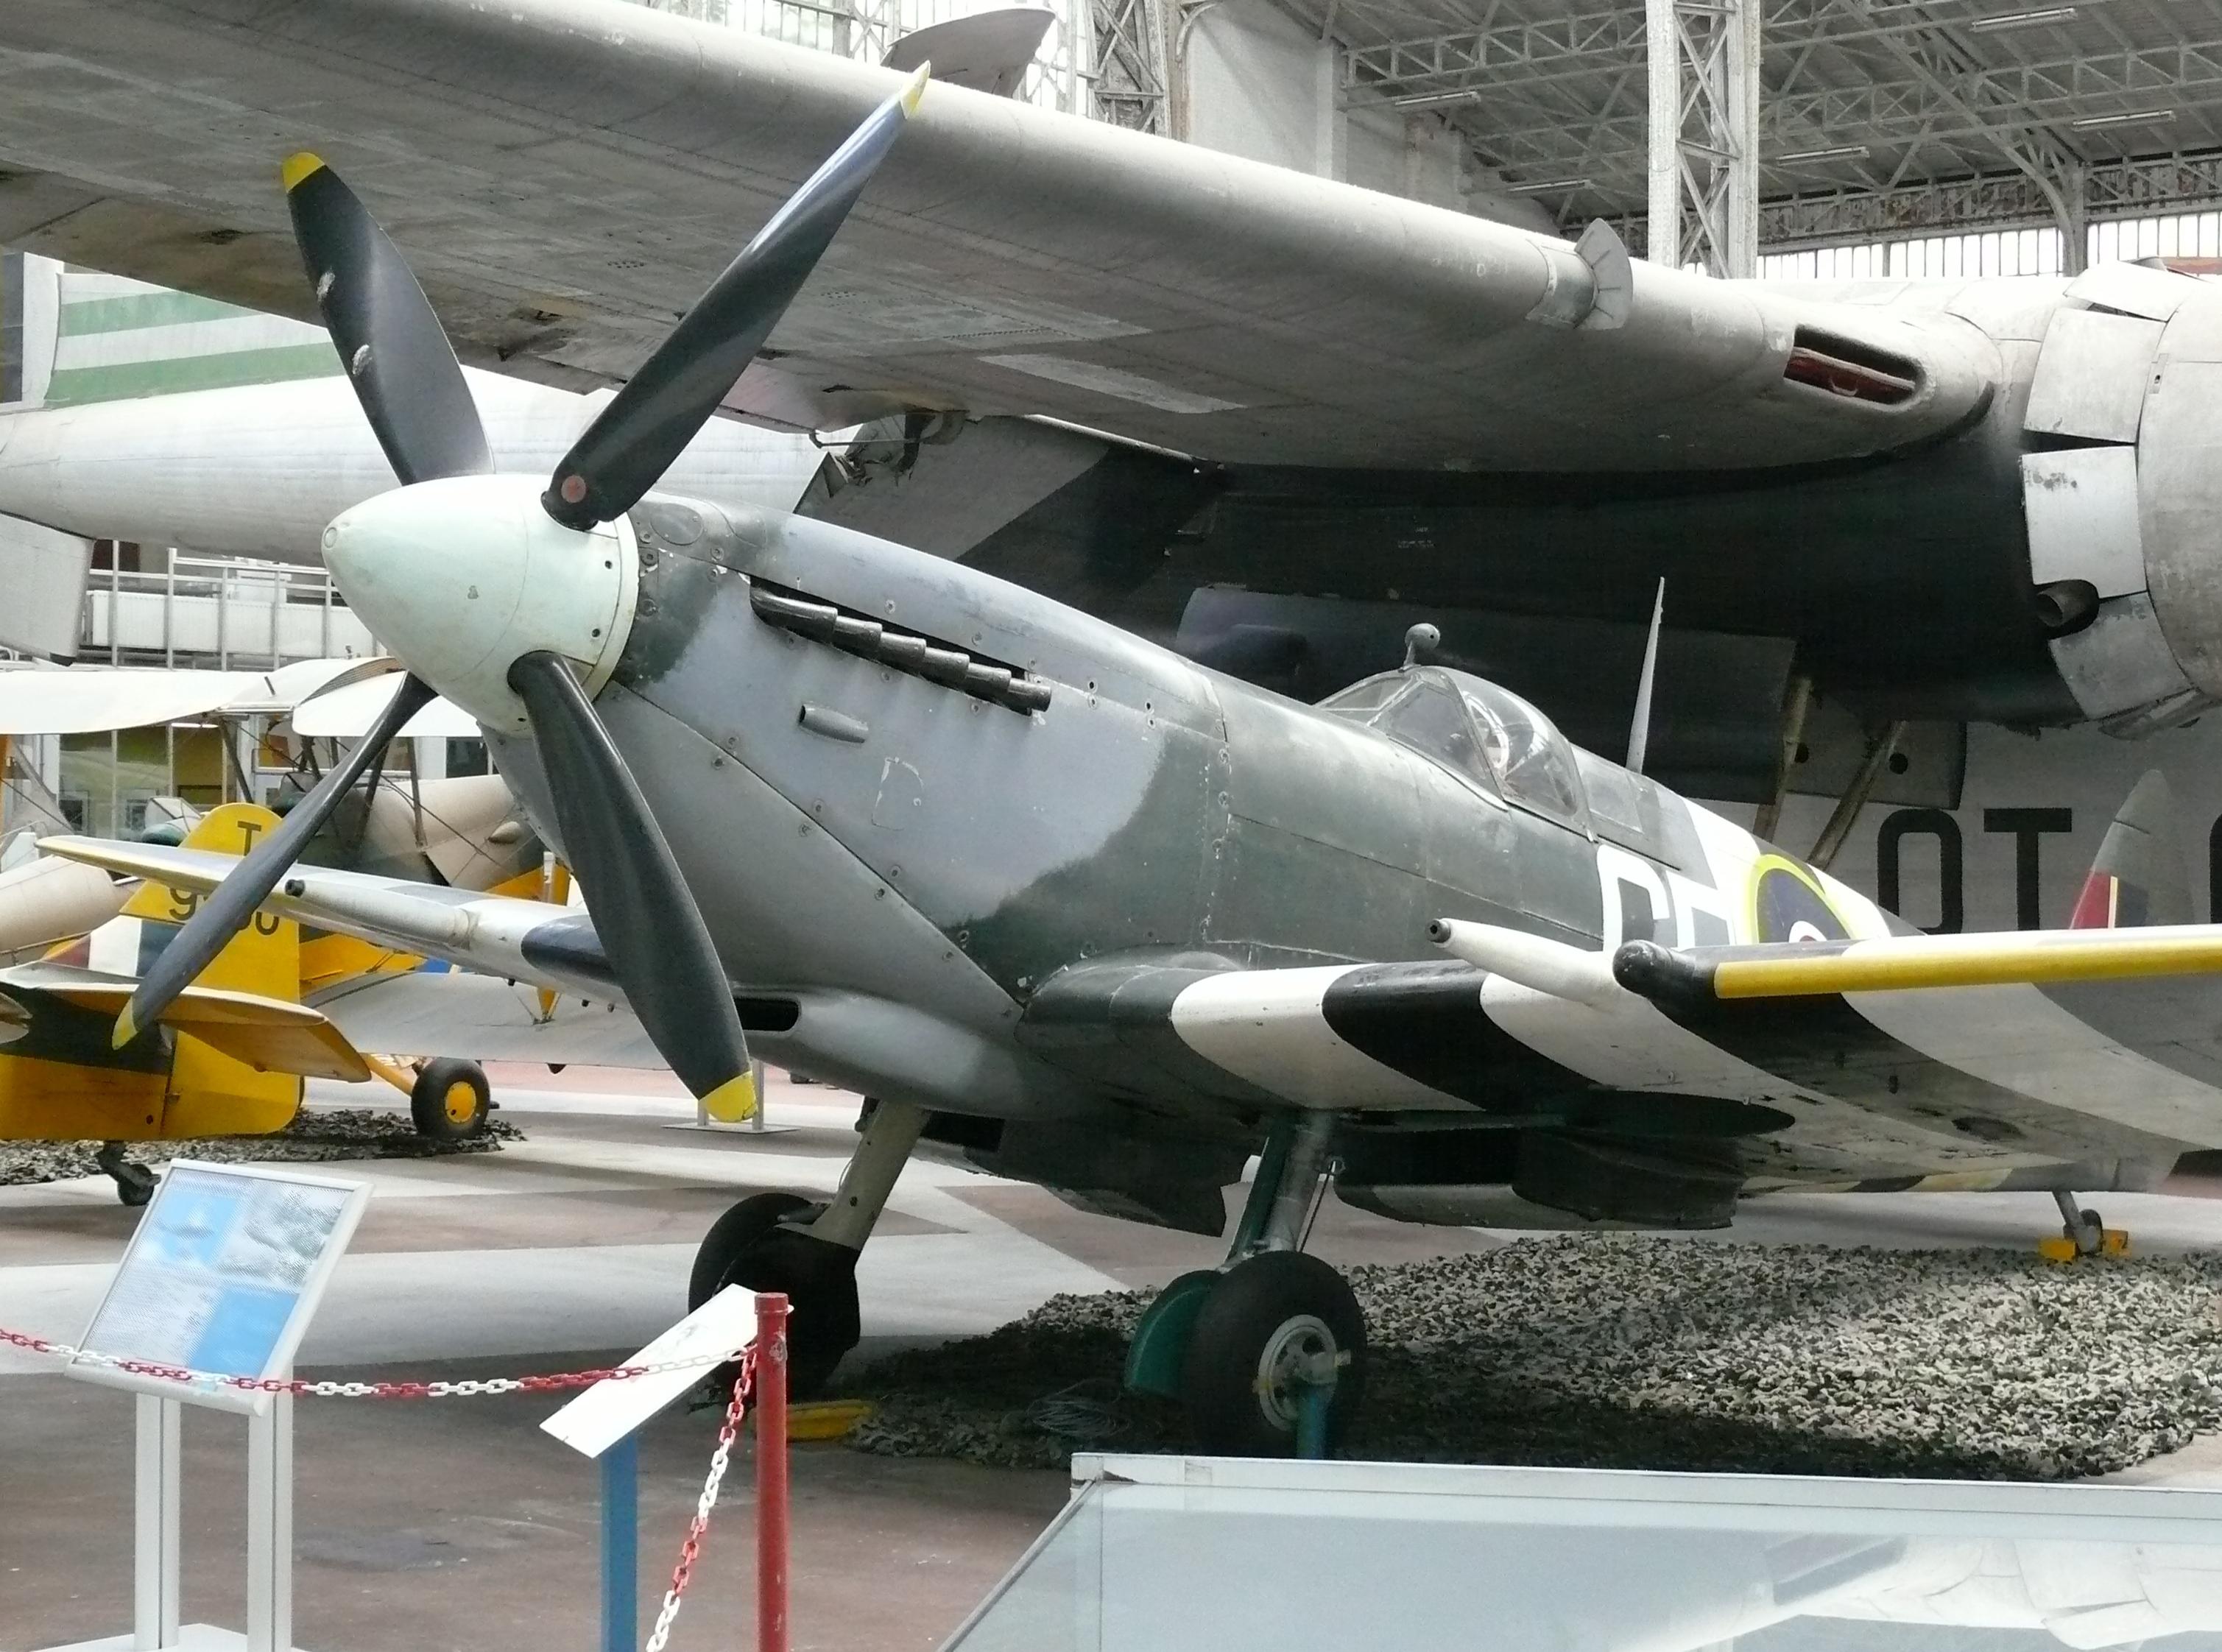 File:RMM Brussel Spitfire Mk IX 2 jpg  Wikimedia Commons